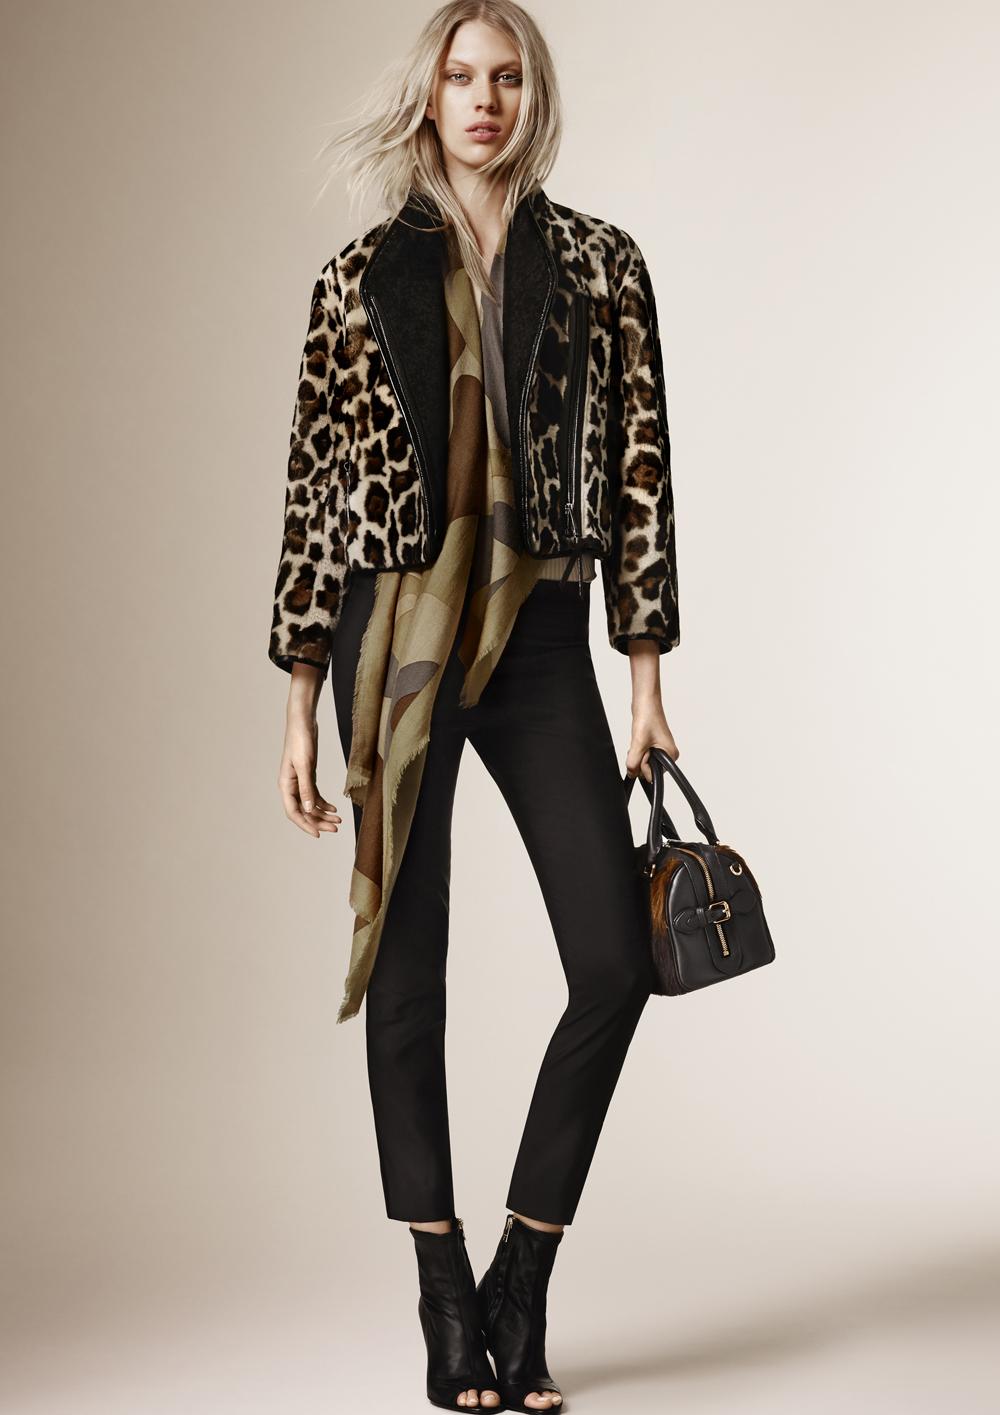 Burberry_Prorsum_Womenswear_Autumn_Winter_2015_Pre-Collection_06